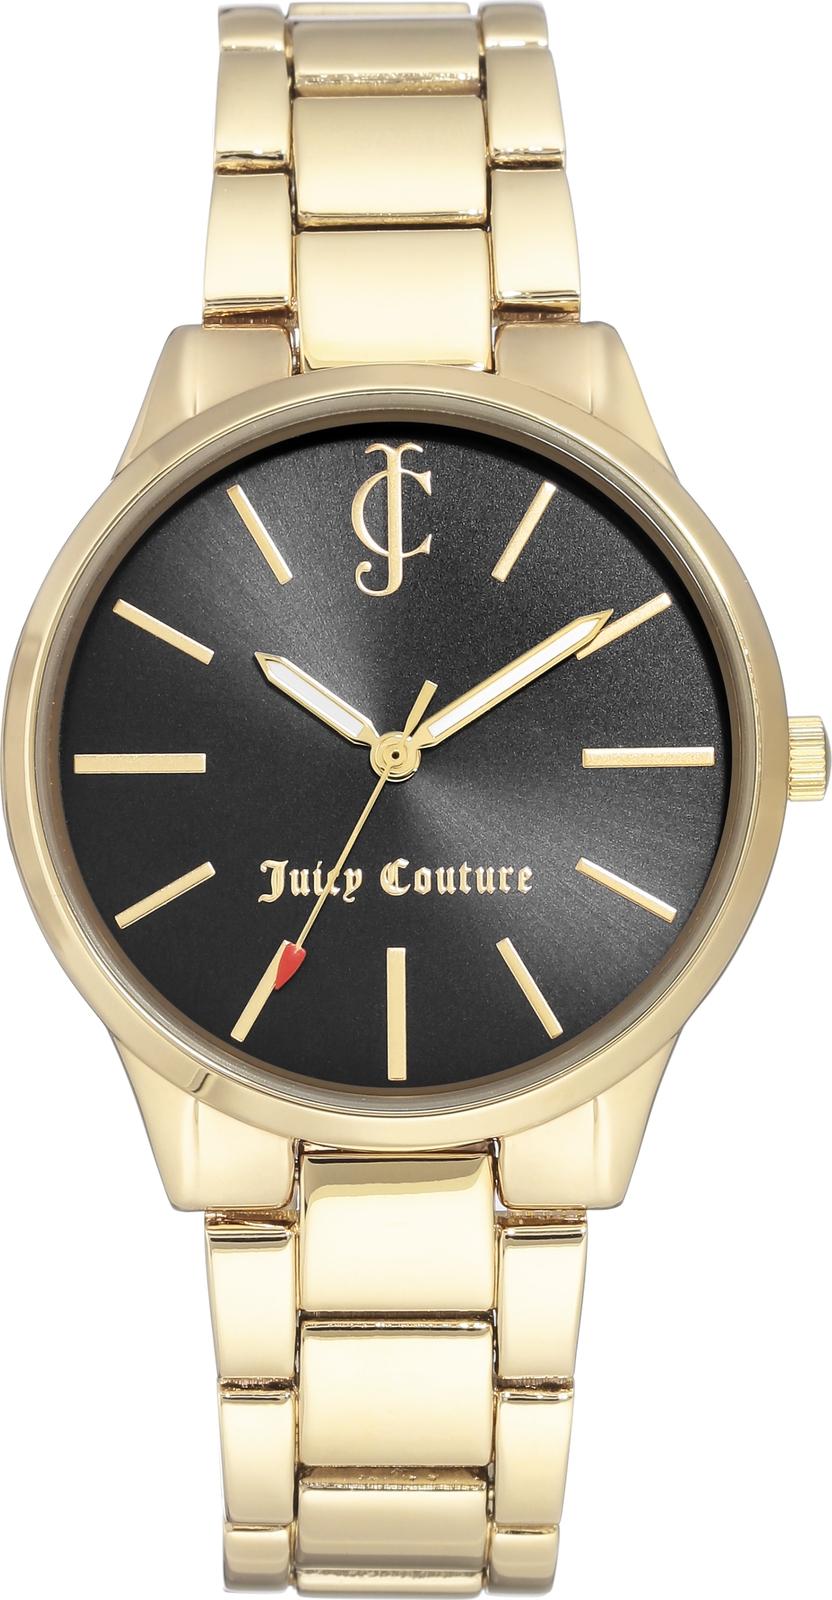 Часы Juicy Couture женские черный часы nixon time teller deluxe leather navy sunray brow